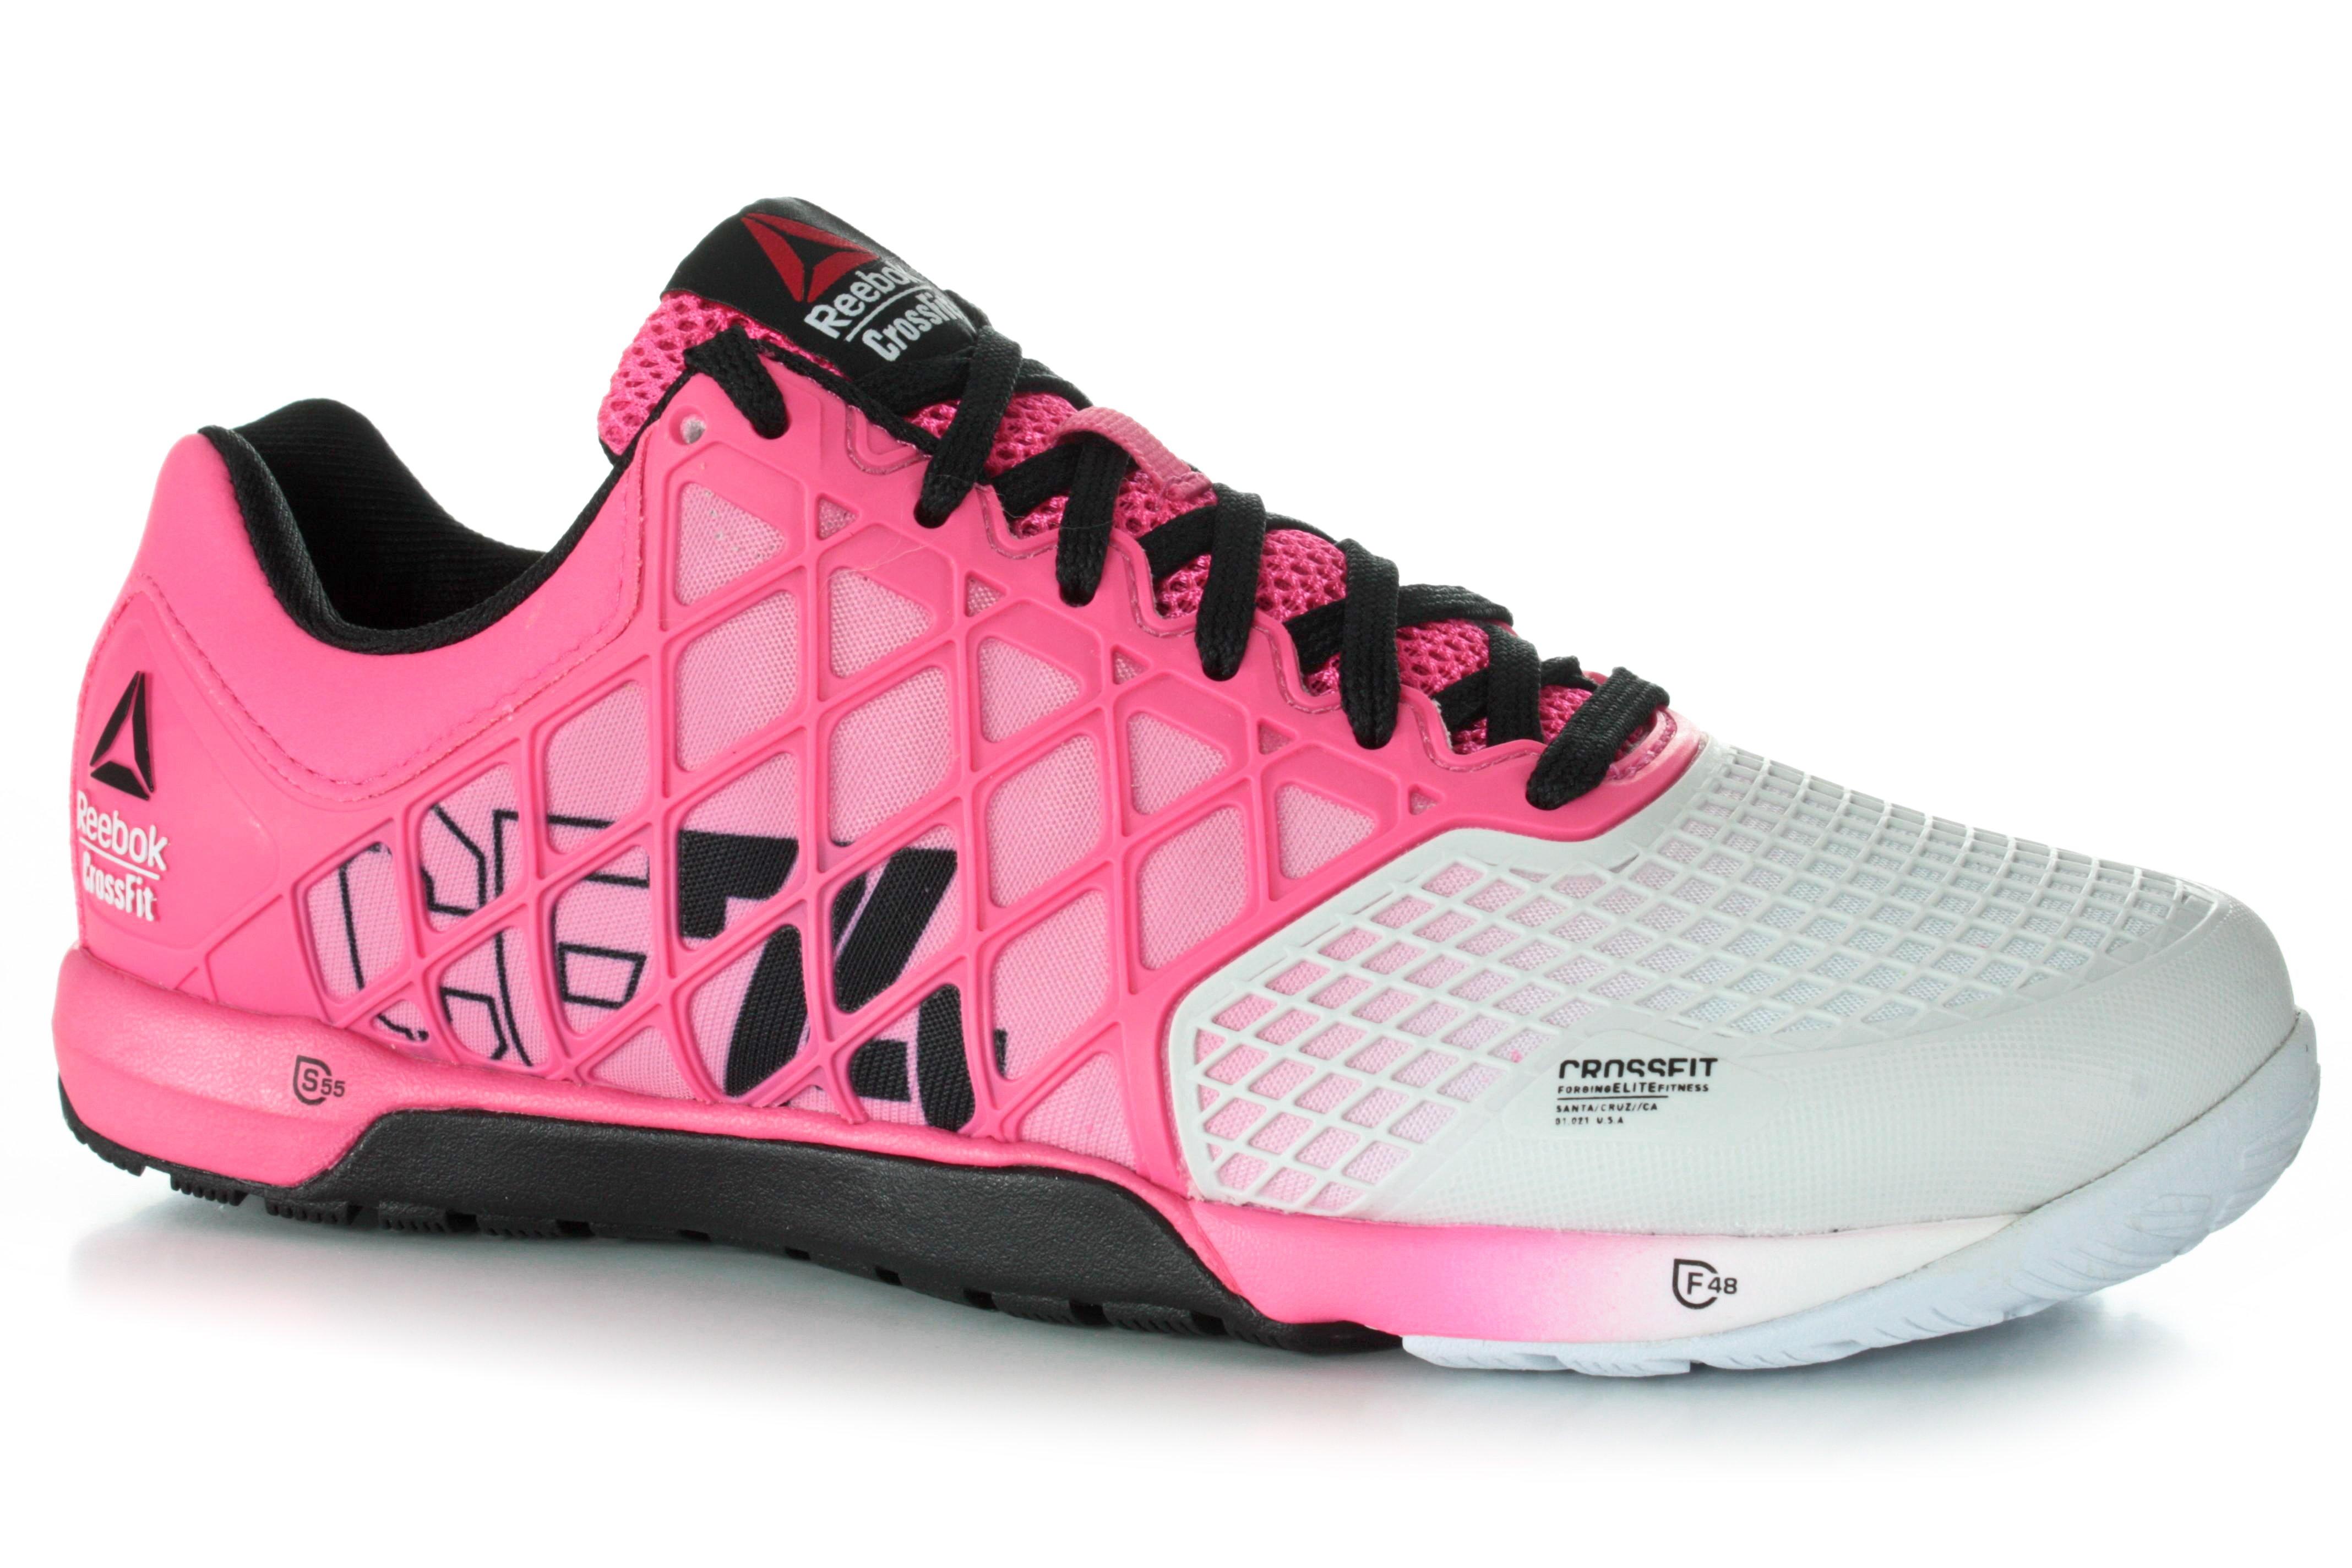 reebok crossfit nano 4 0 m chaussures homme r f m48817 running track. Black Bedroom Furniture Sets. Home Design Ideas